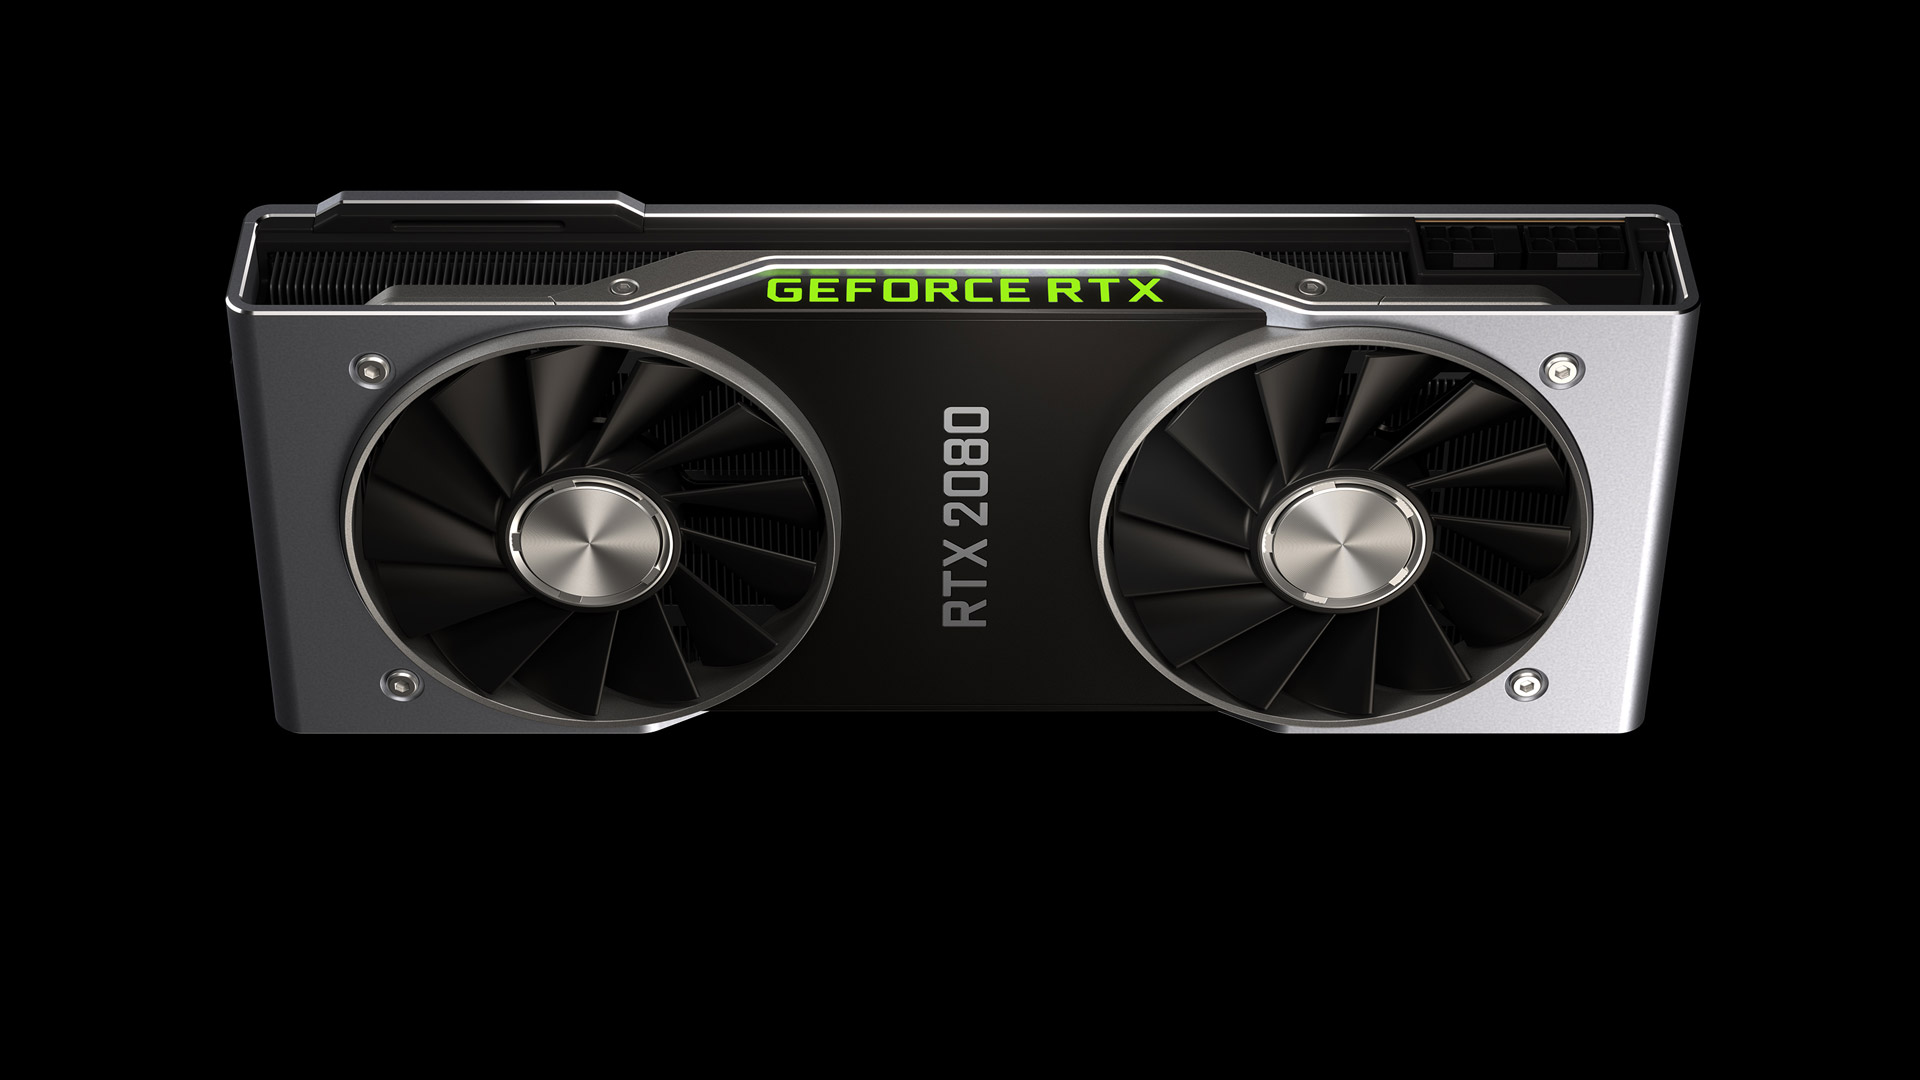 nvidia-geforce-rtx-2080.jpg